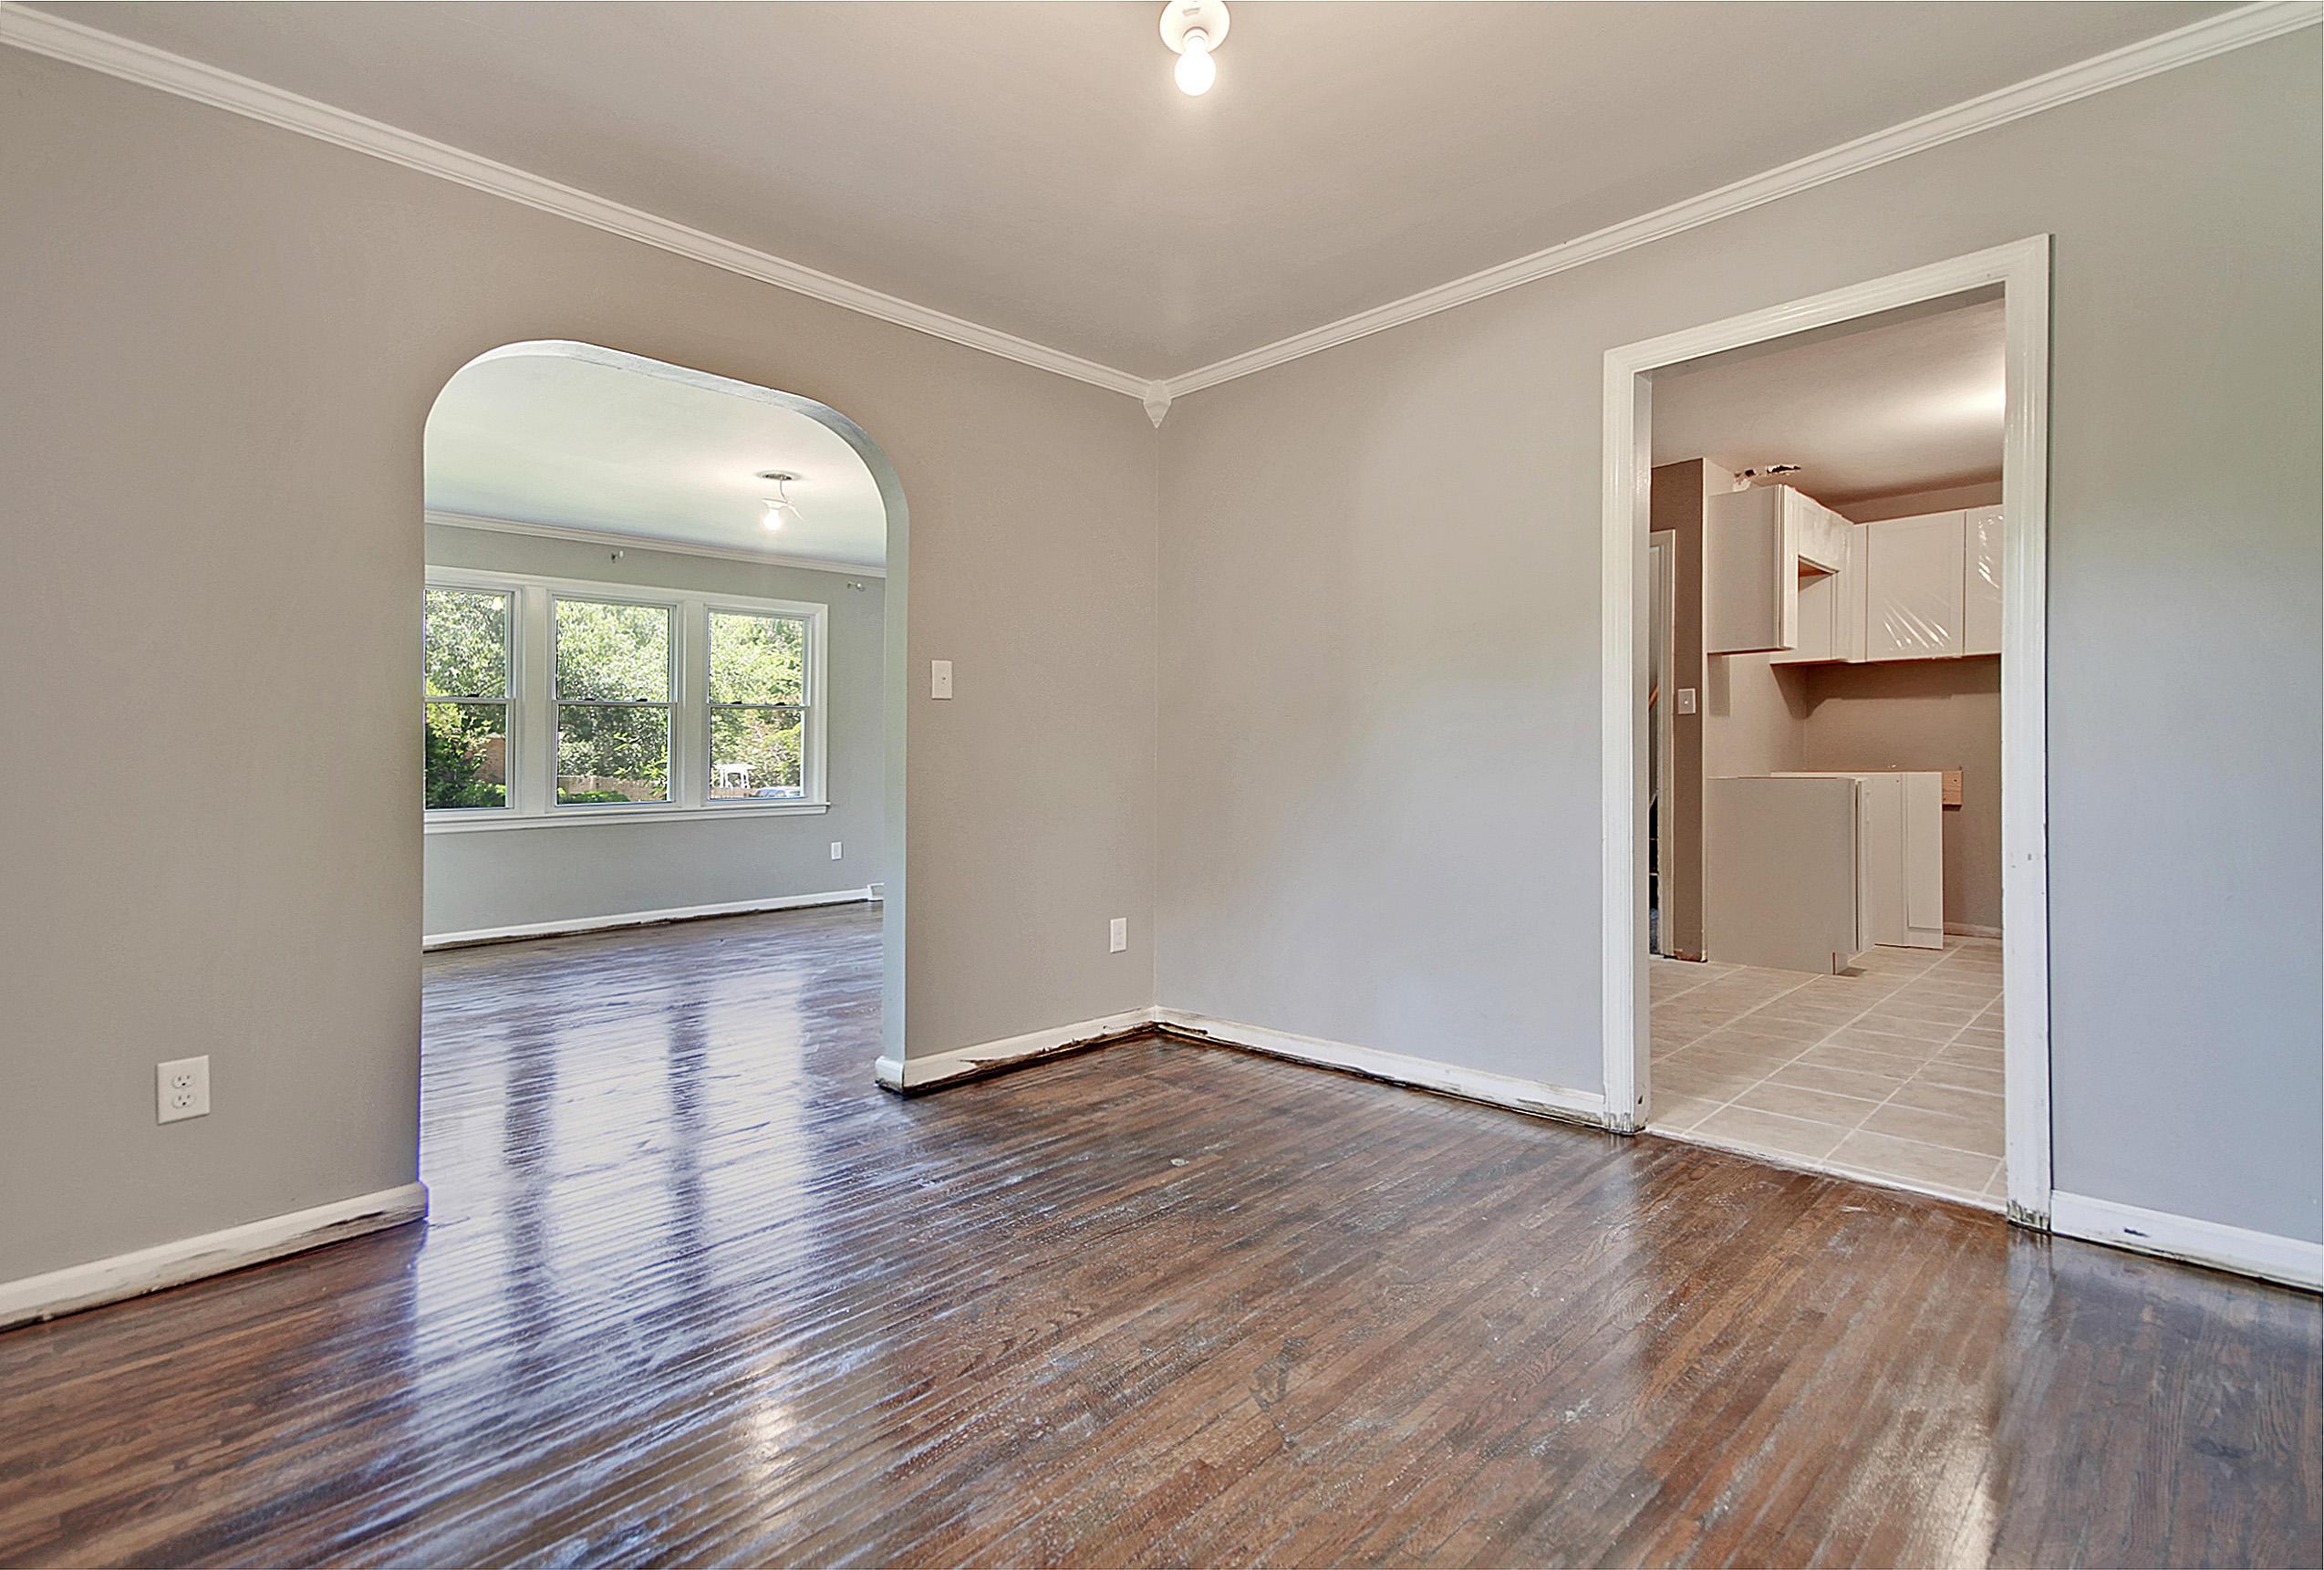 Northbridge Terrace Homes For Sale - 1094 Northbridge, Charleston, SC - 7